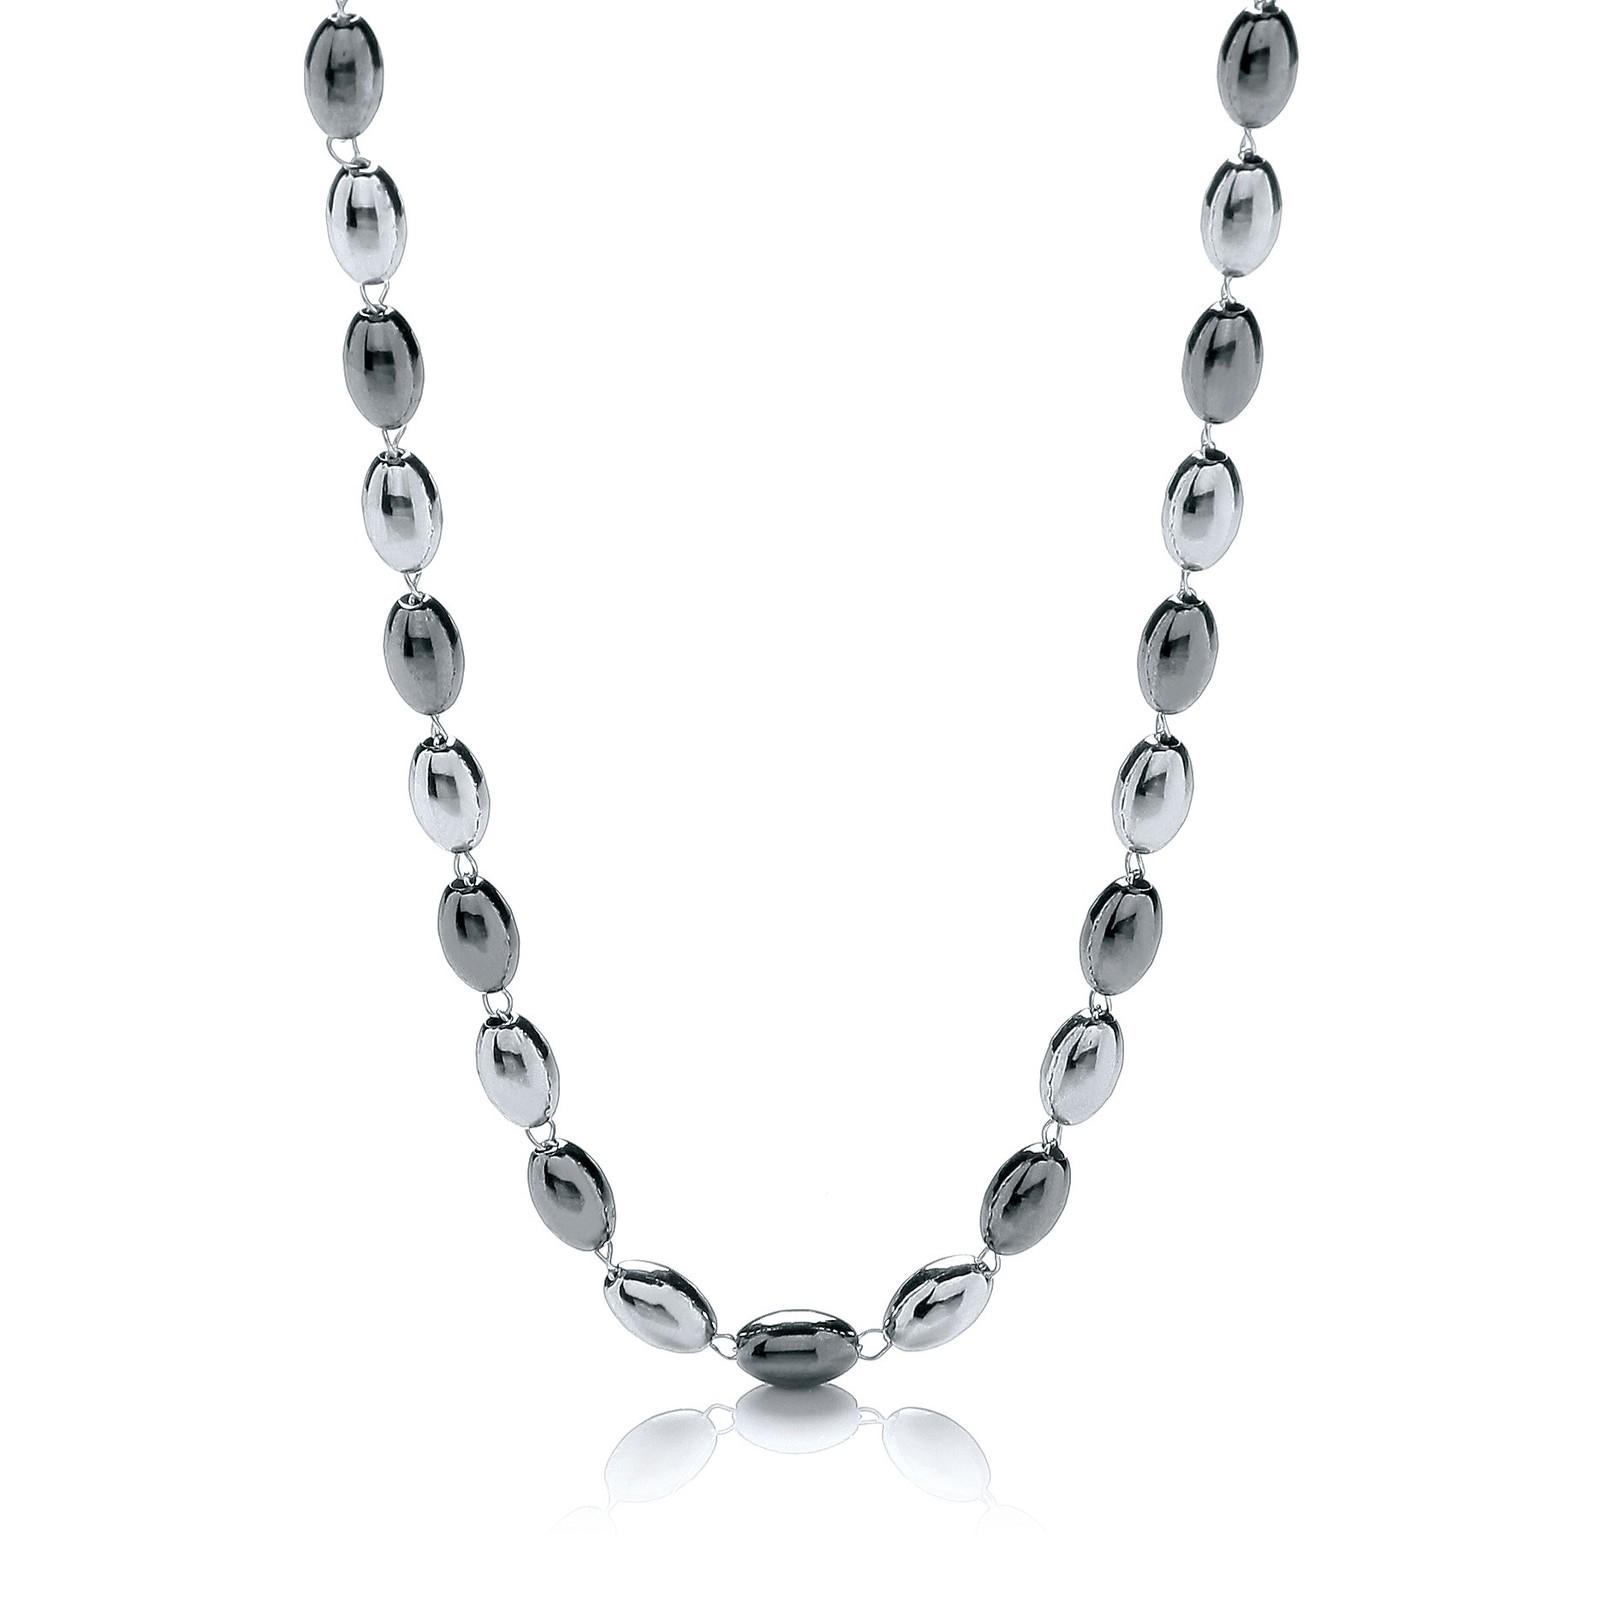 "Silver & Ruthenium Oval Bead Necklace 36""/92cm"